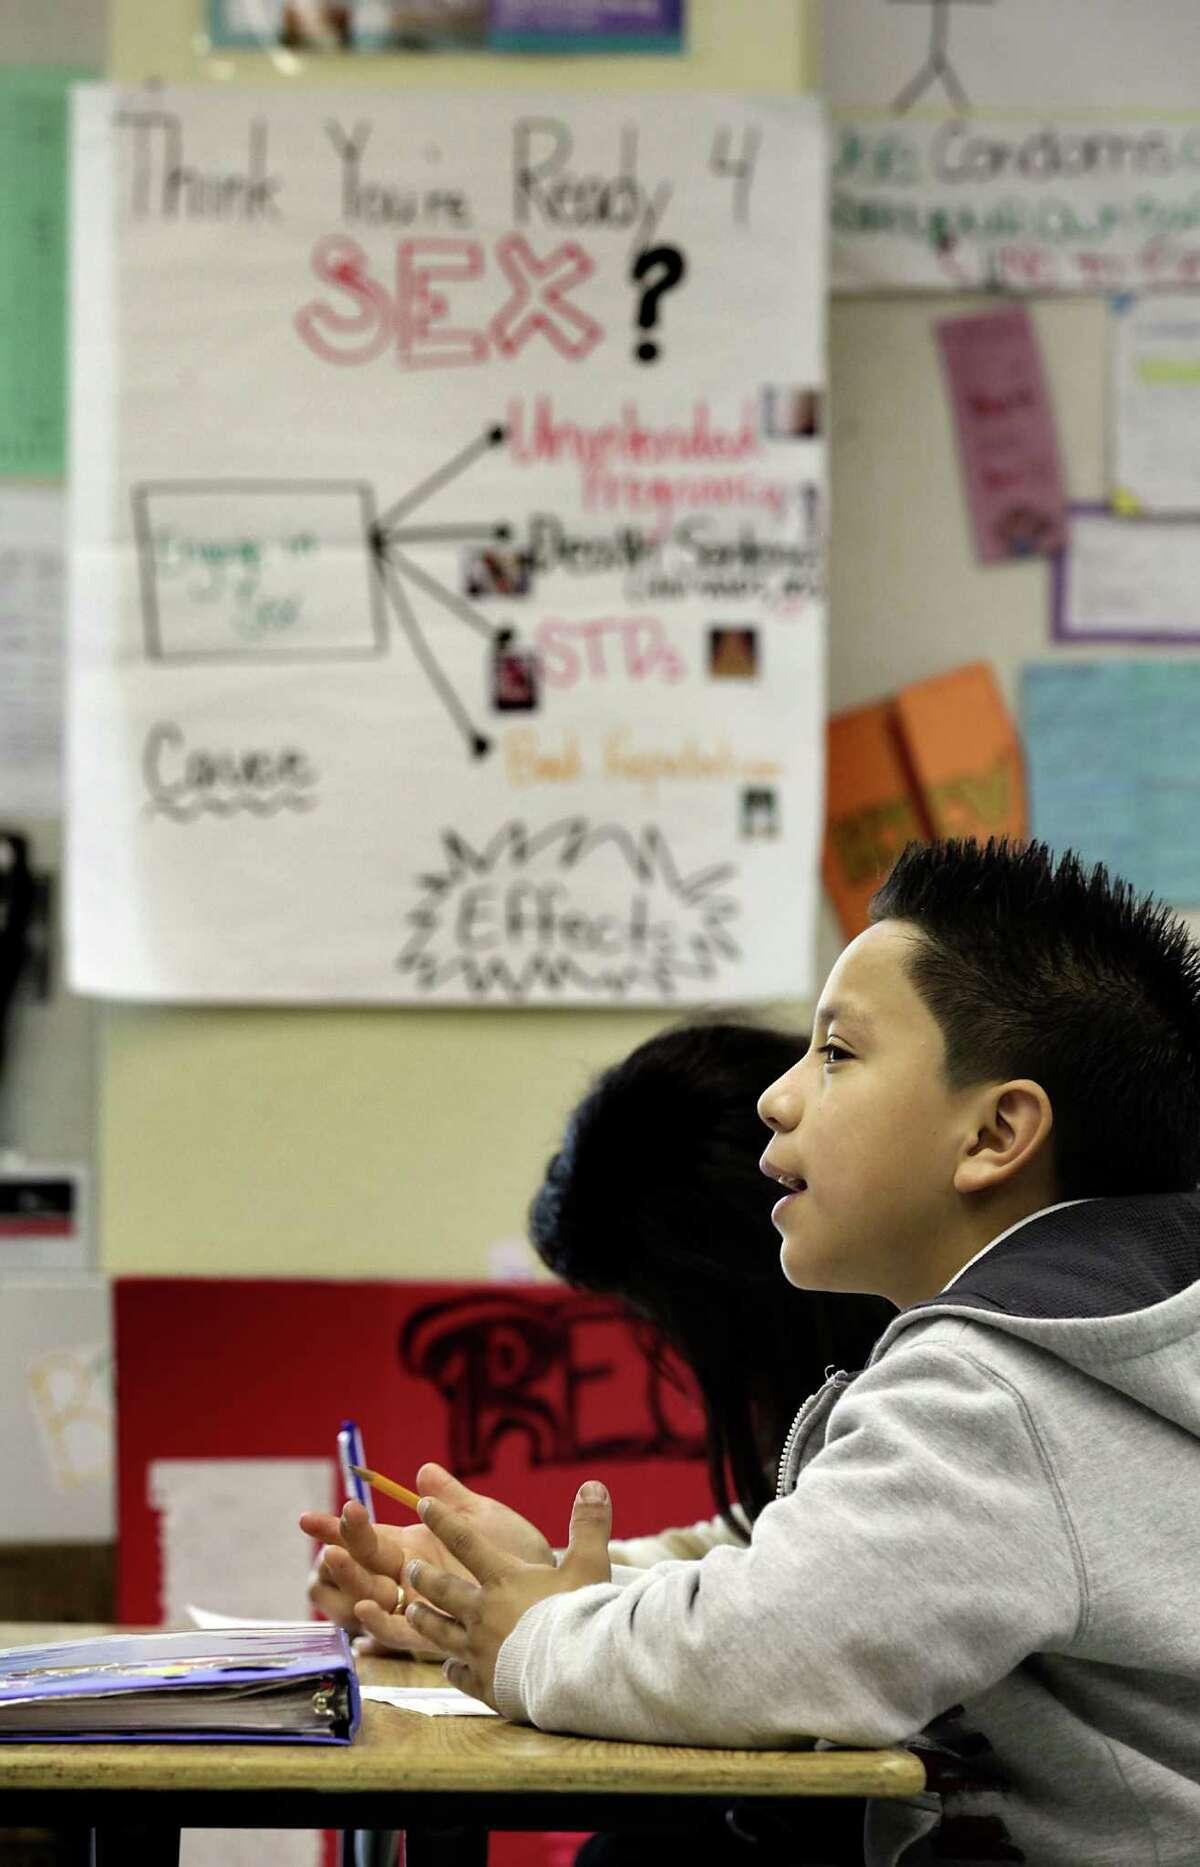 Jafet Ramirez, 12, in Kristie Barisdale's Health Class at Los Angeles Academy Middle School in Los Angeles. Thursday, Jan. 19, 2012. Bob Owen/San Antonio Express-News